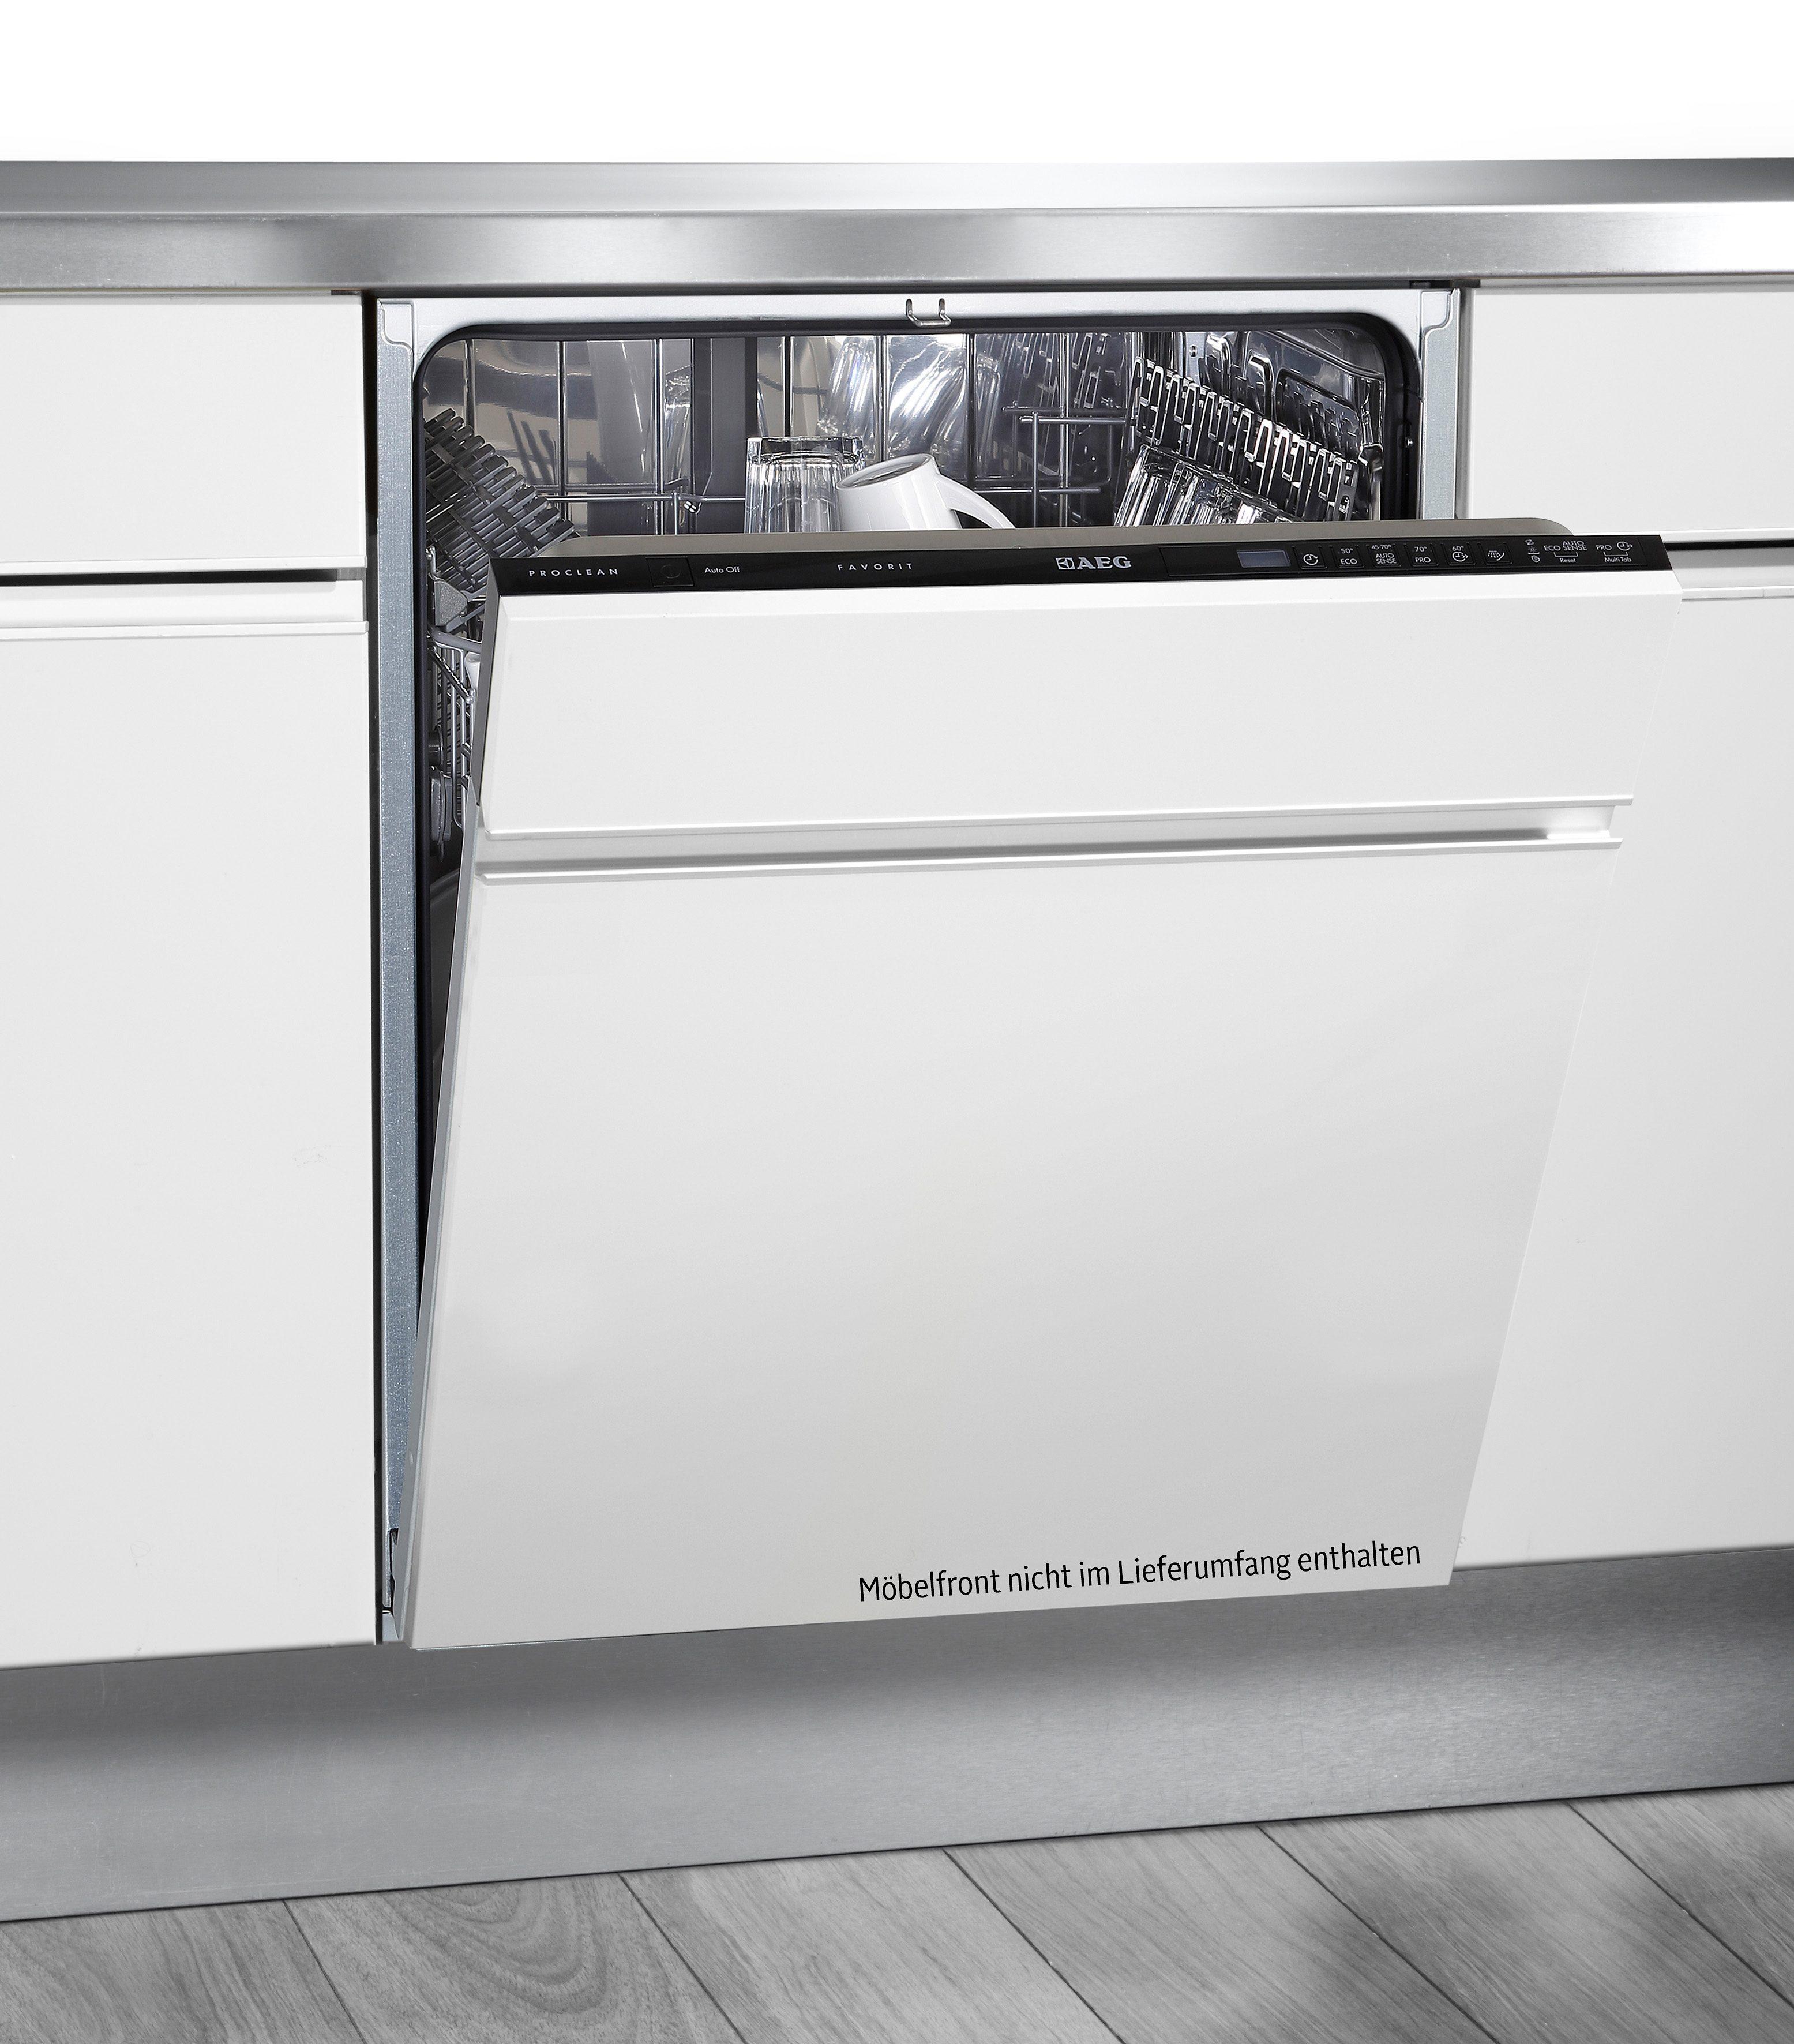 AEG vollintegrierbarer Geschirrspüler FAVORIT F55602VI0P, A++, 10,2 Liter, 13 Maßgedecke